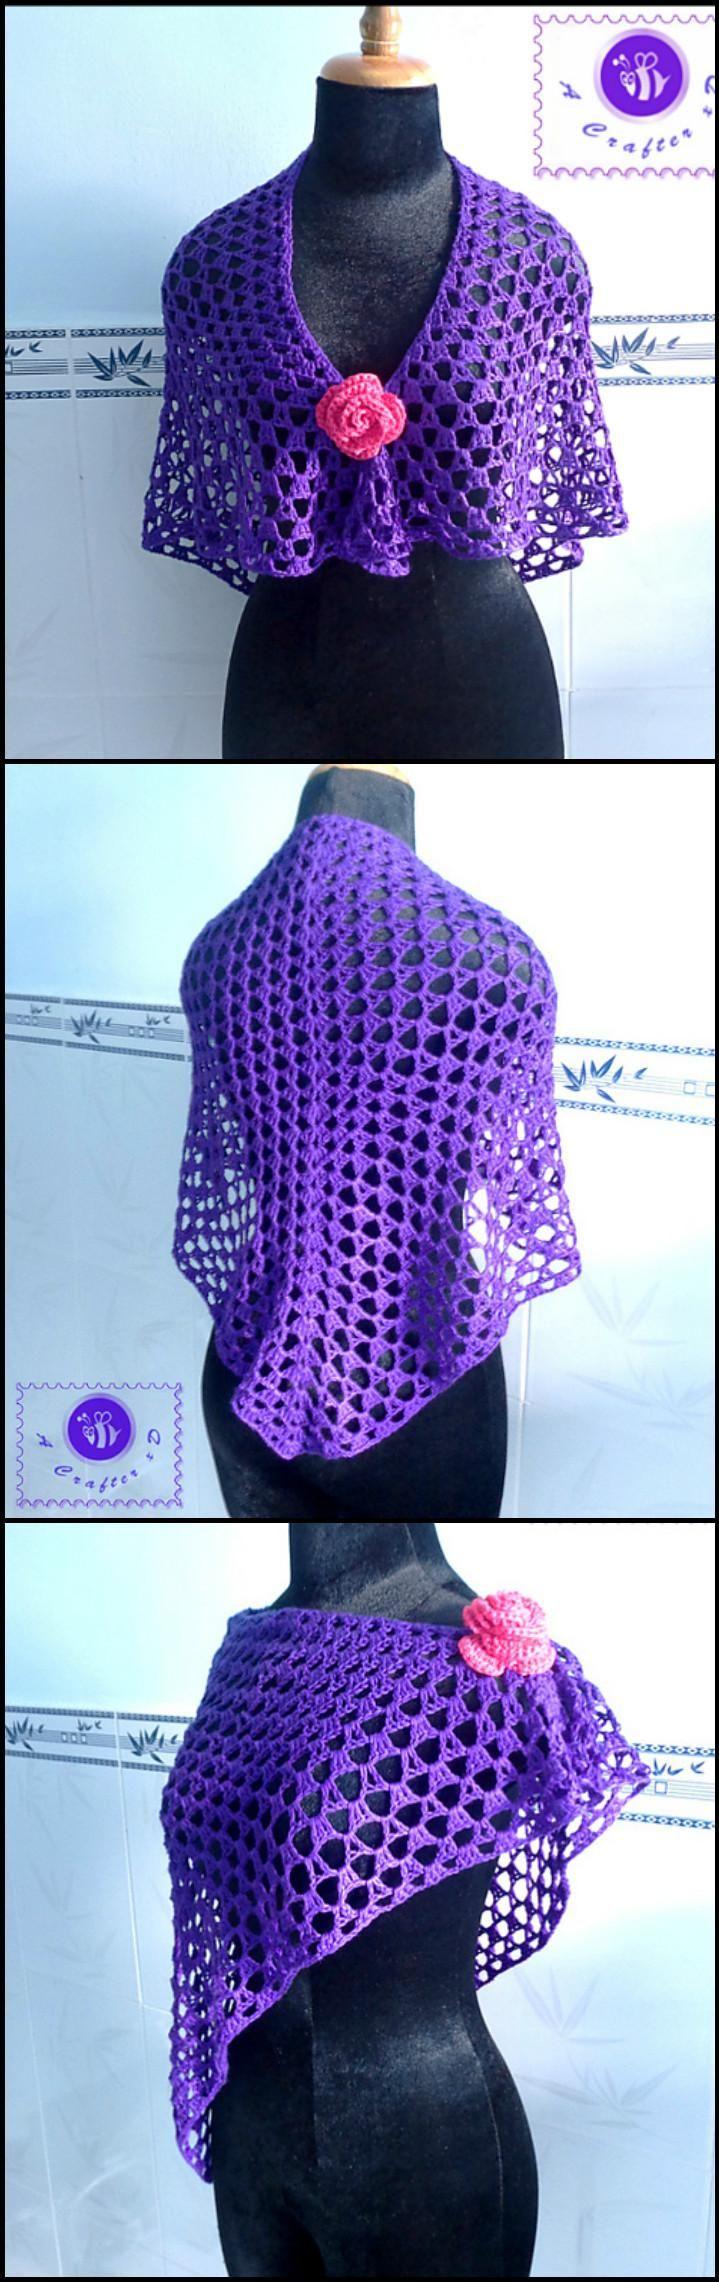 100 Free Crochet Shawl Patterns - Free Crochet Patterns - Page 8 of 19 - DIY & Crafts